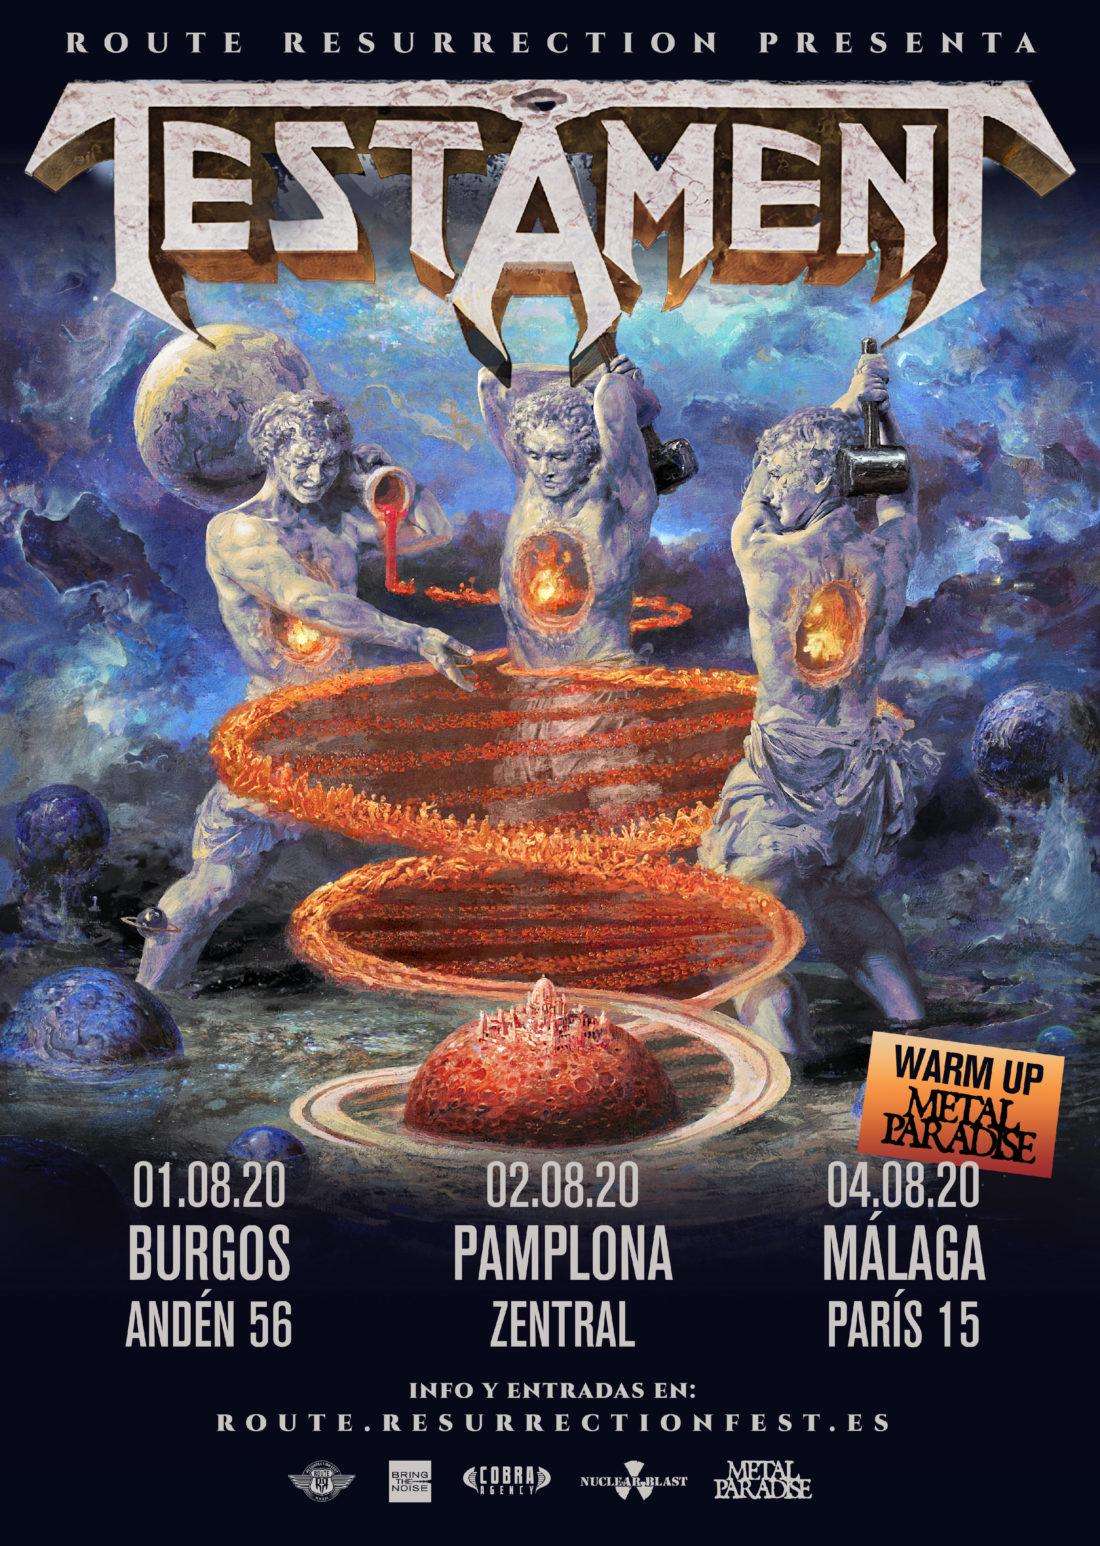 Testament vuelve este verano de gira Route Resurrection a presentar su nuevo disco